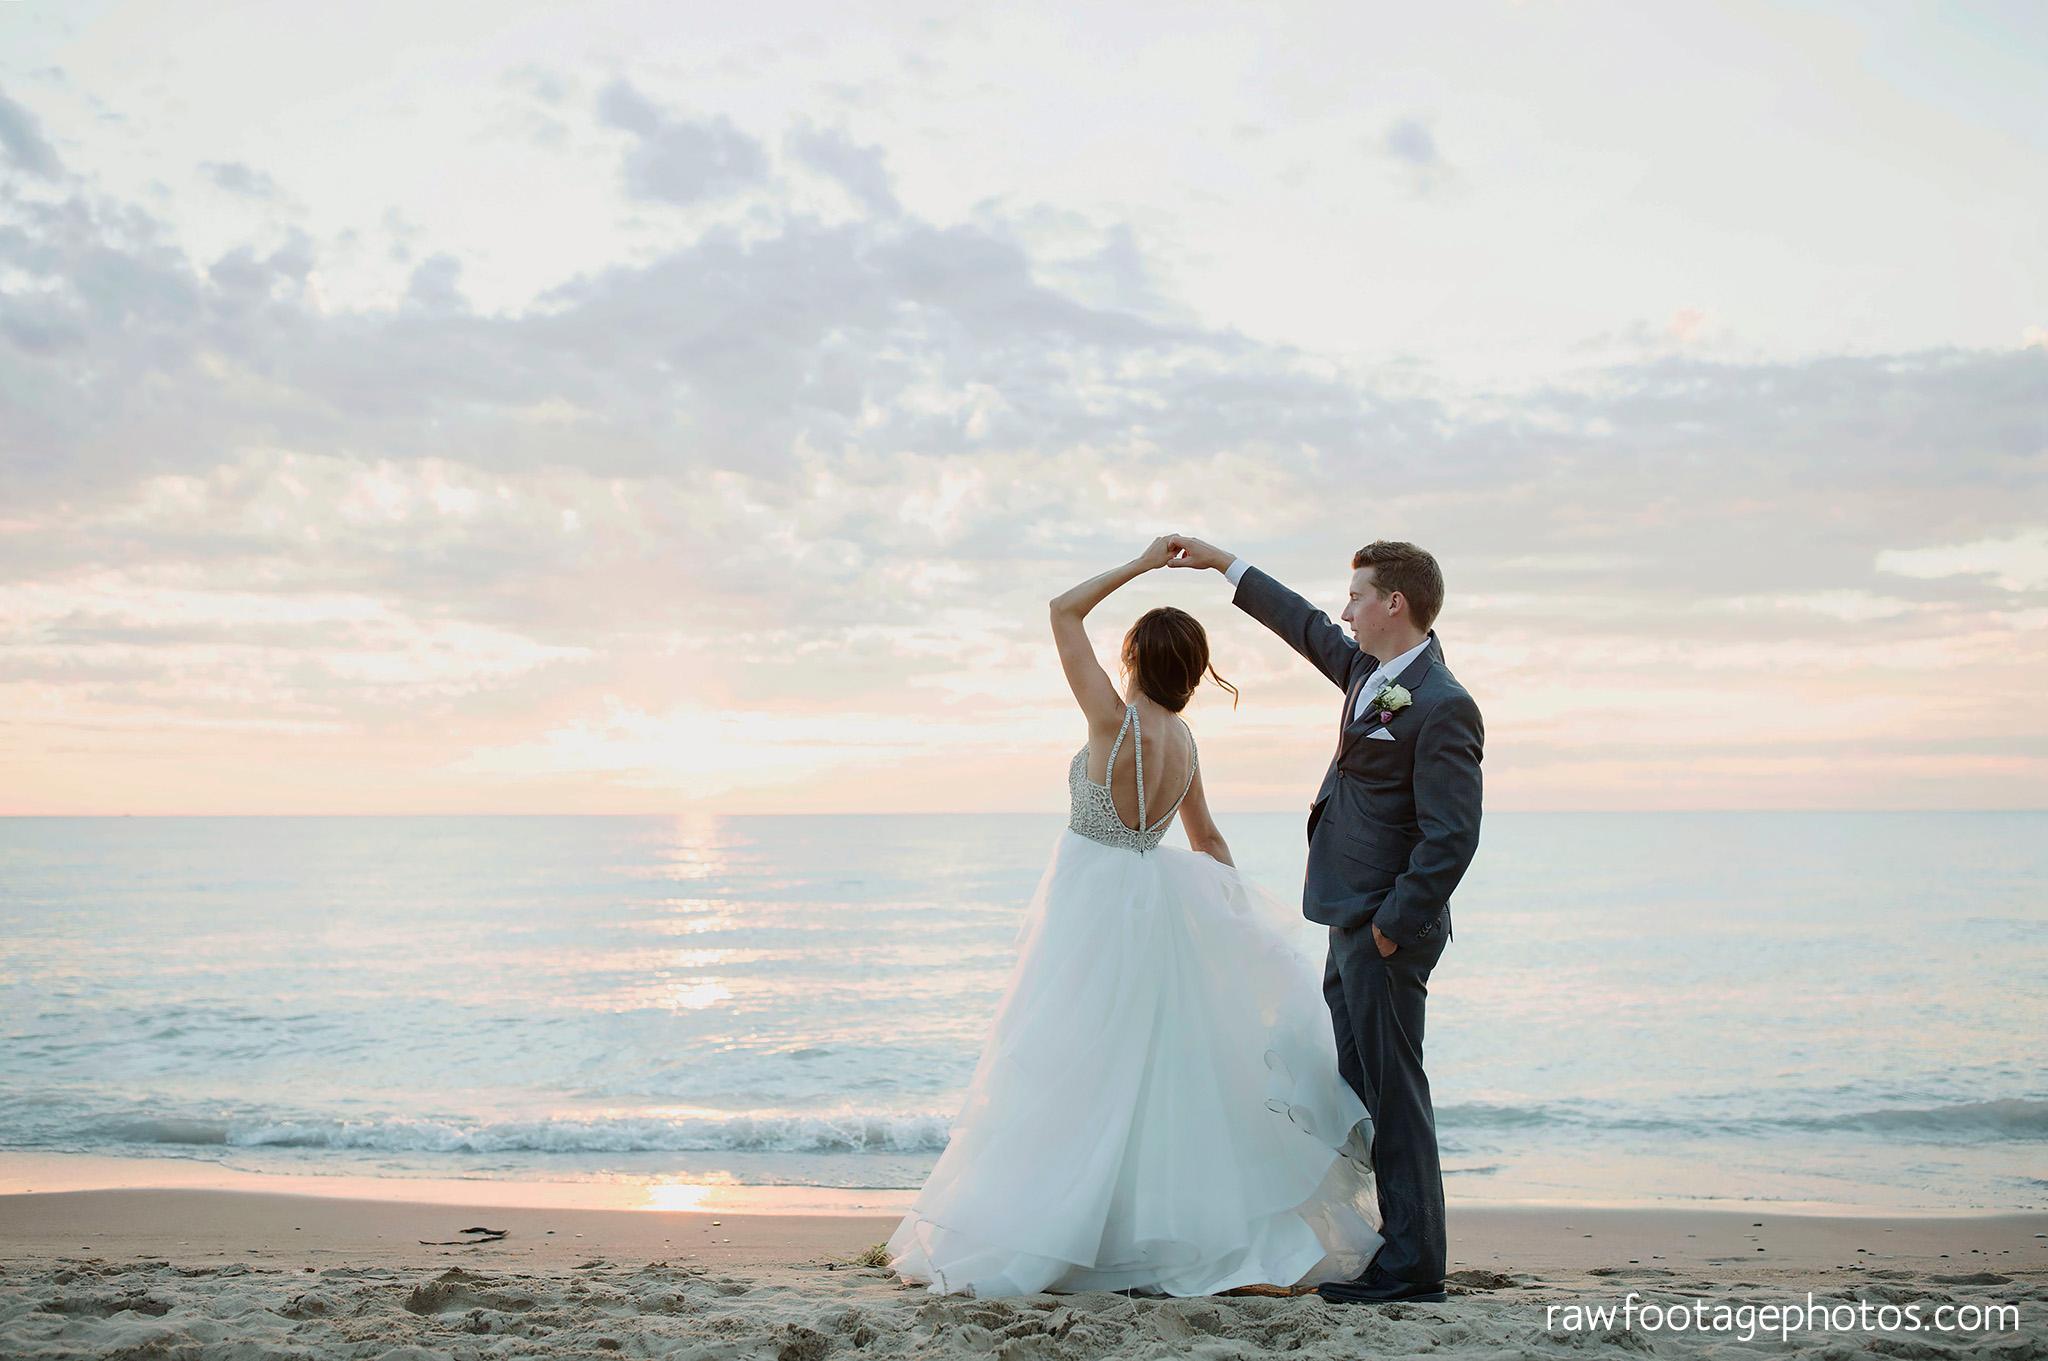 london_ontario_wedding_photographer-grand_bend_wedding_photographer-oakwood_resort_wedding-beach_wedding-sunset_wedding-raw_footage_photography070.jpg